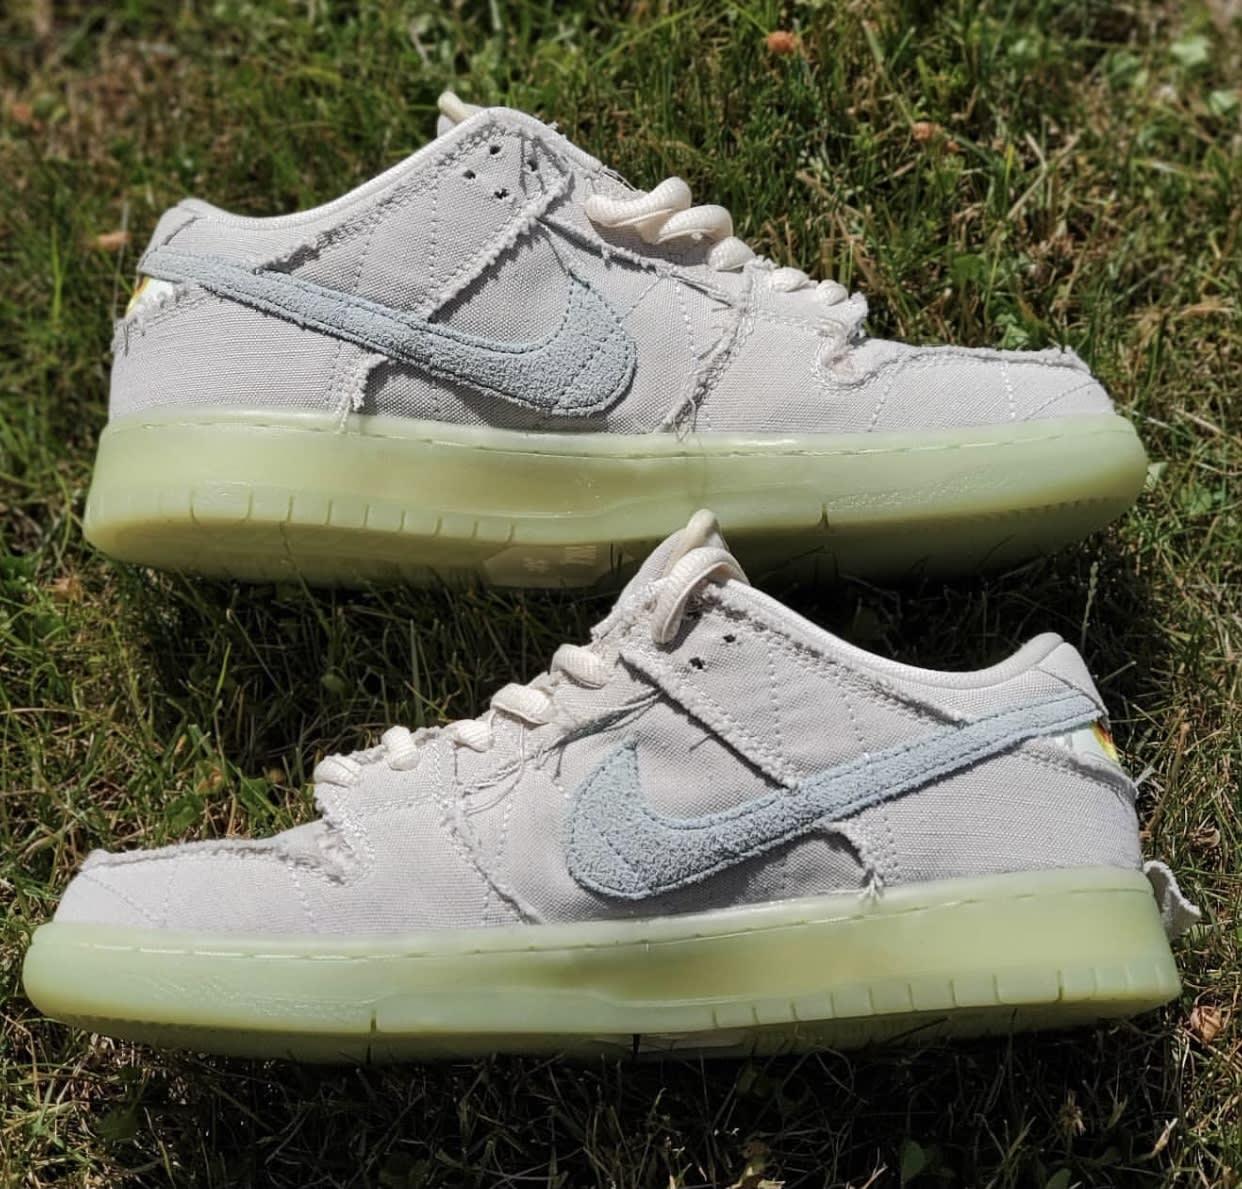 Nike SB Dunk Low Mummy Halloween DM0774-111 Side